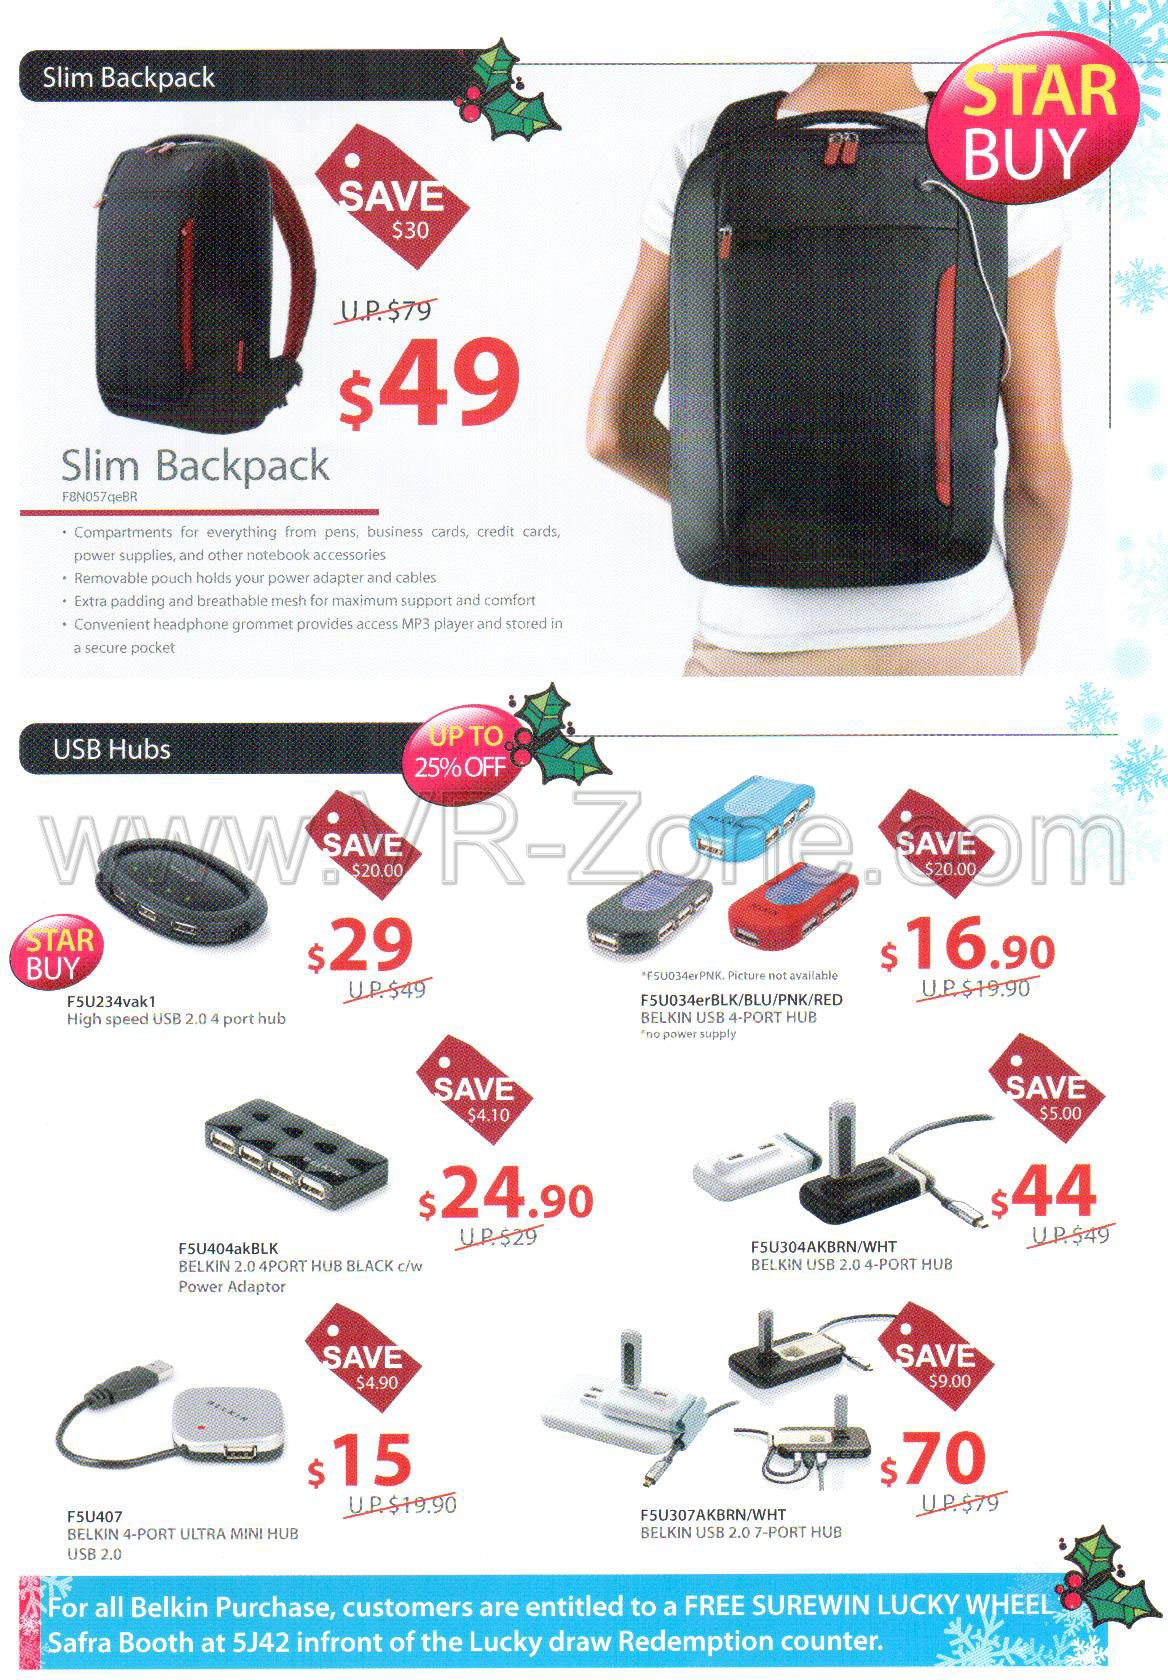 Sitex 2008 price list image brochure of Belkin 3